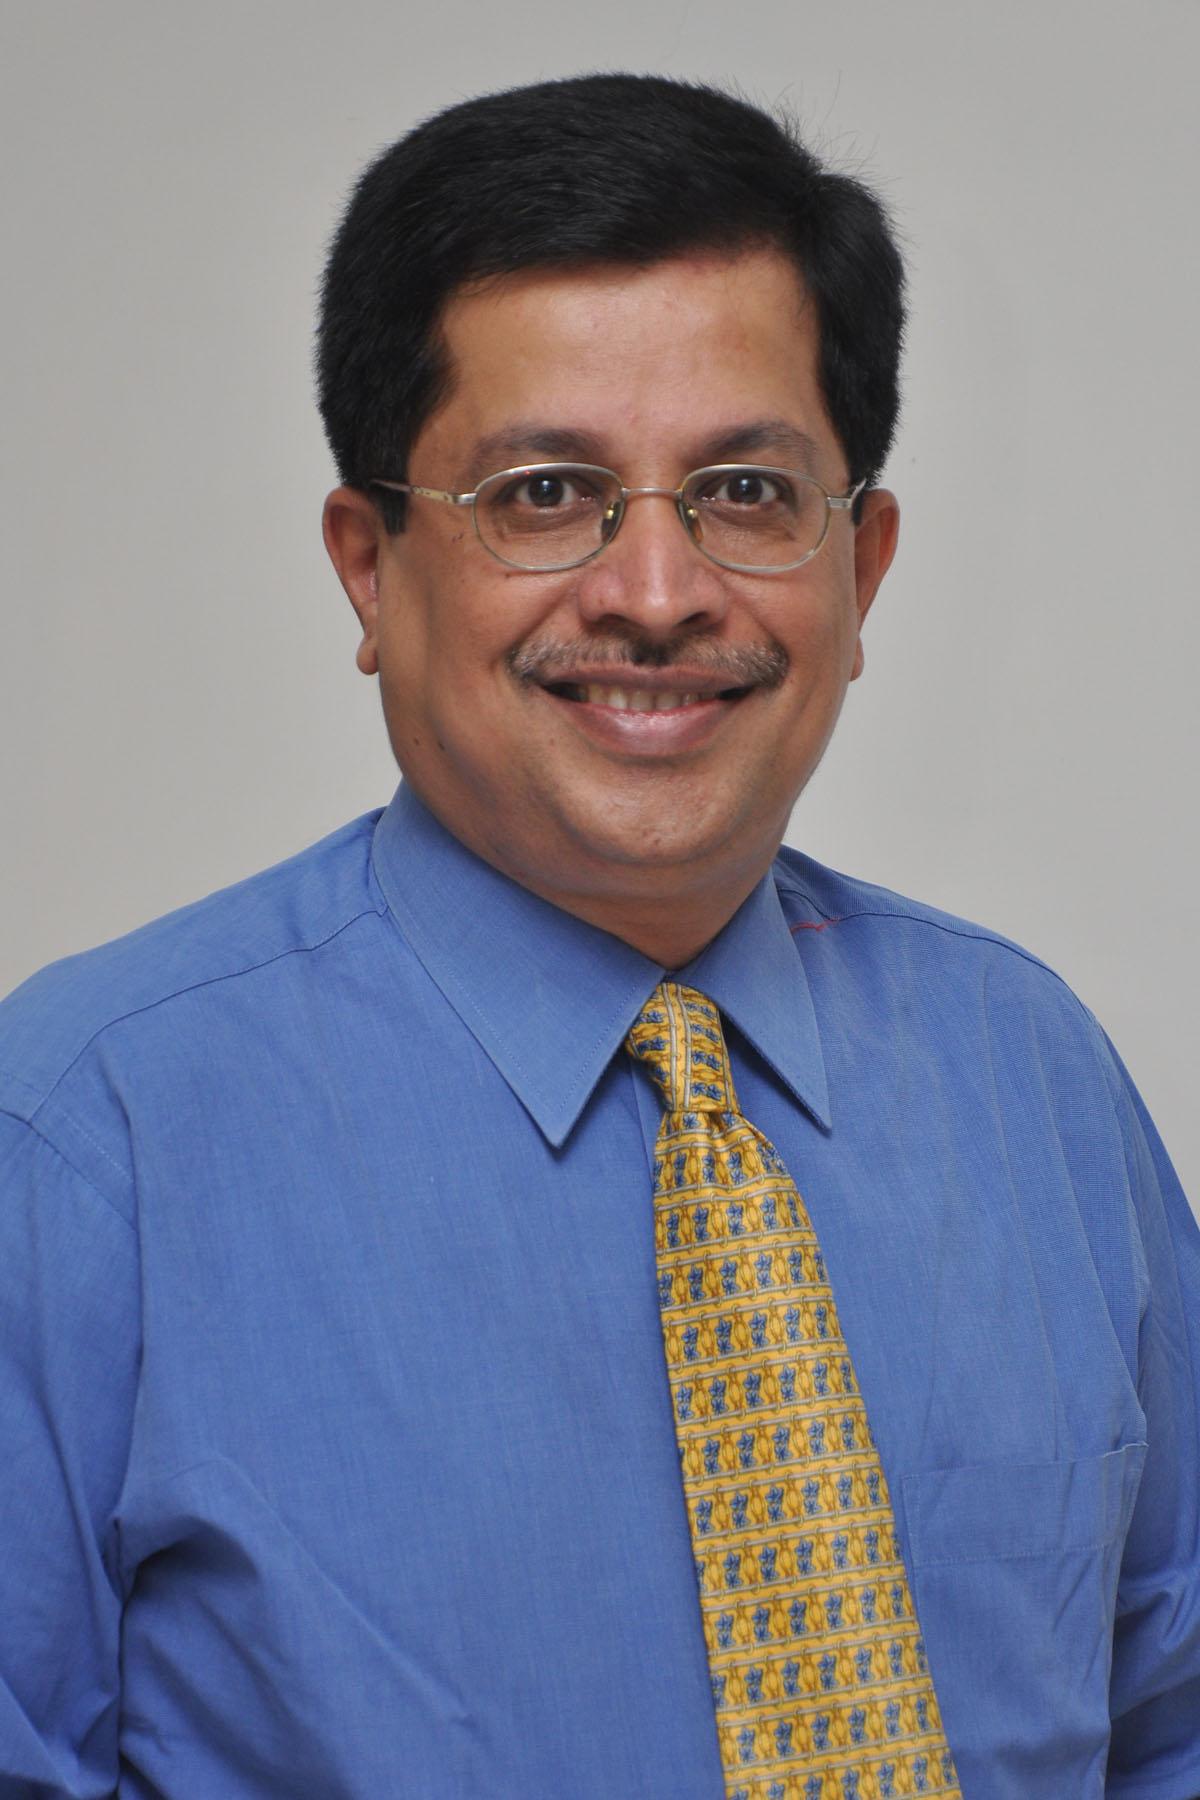 Makarand V. Khochikar